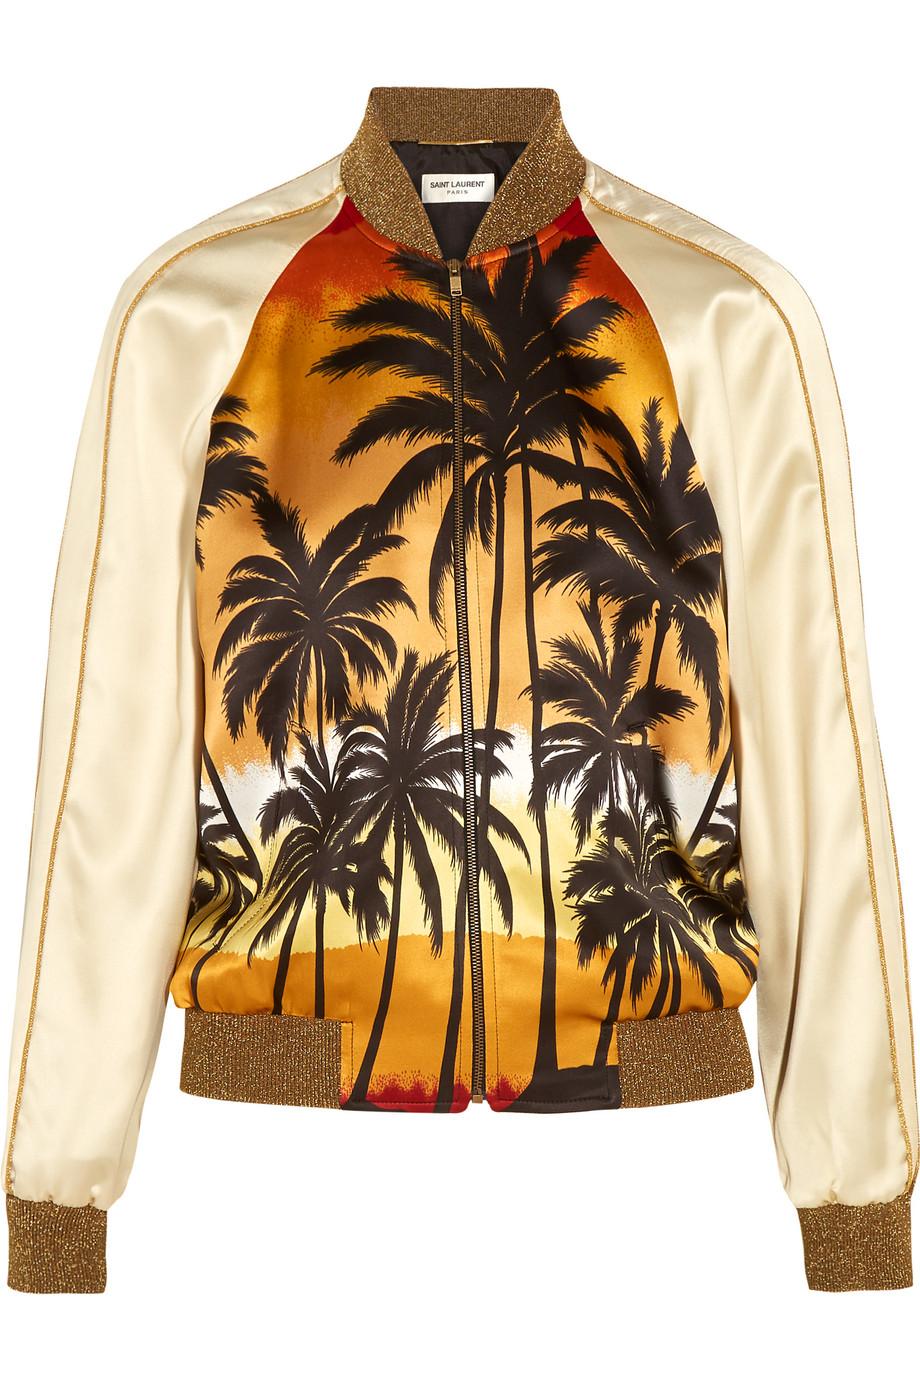 Saint Laurent Printed Satin Bomber Jacket, Size: 36